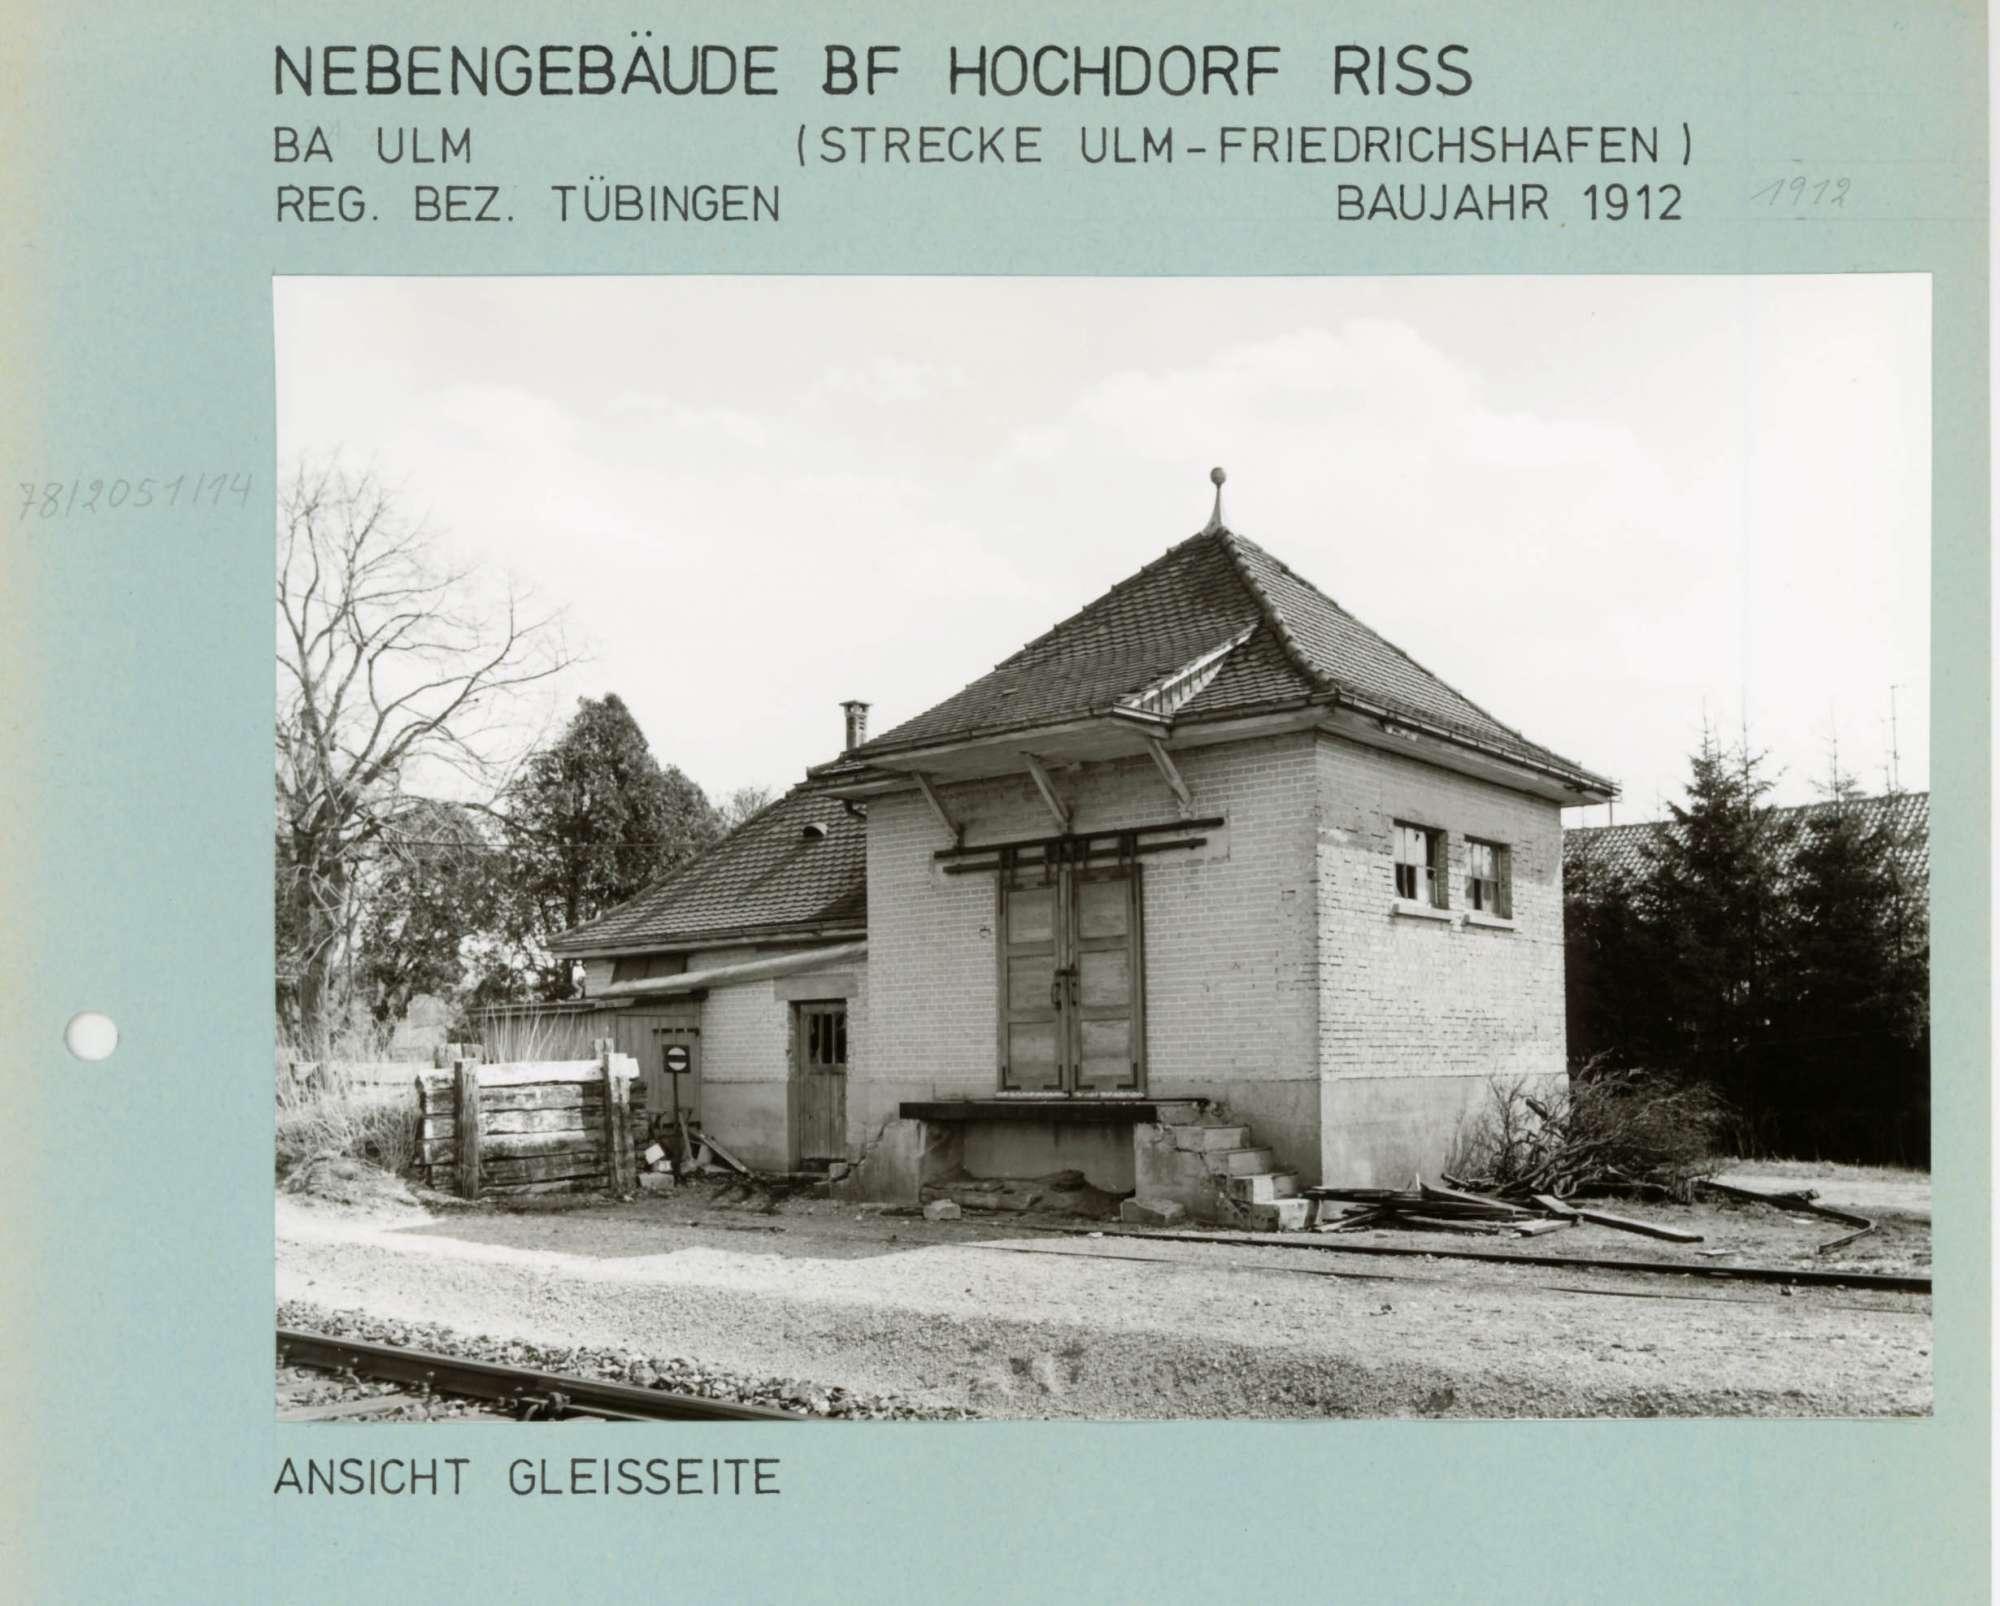 Hochdorf (Riß): 8 Fotos, Bild 3